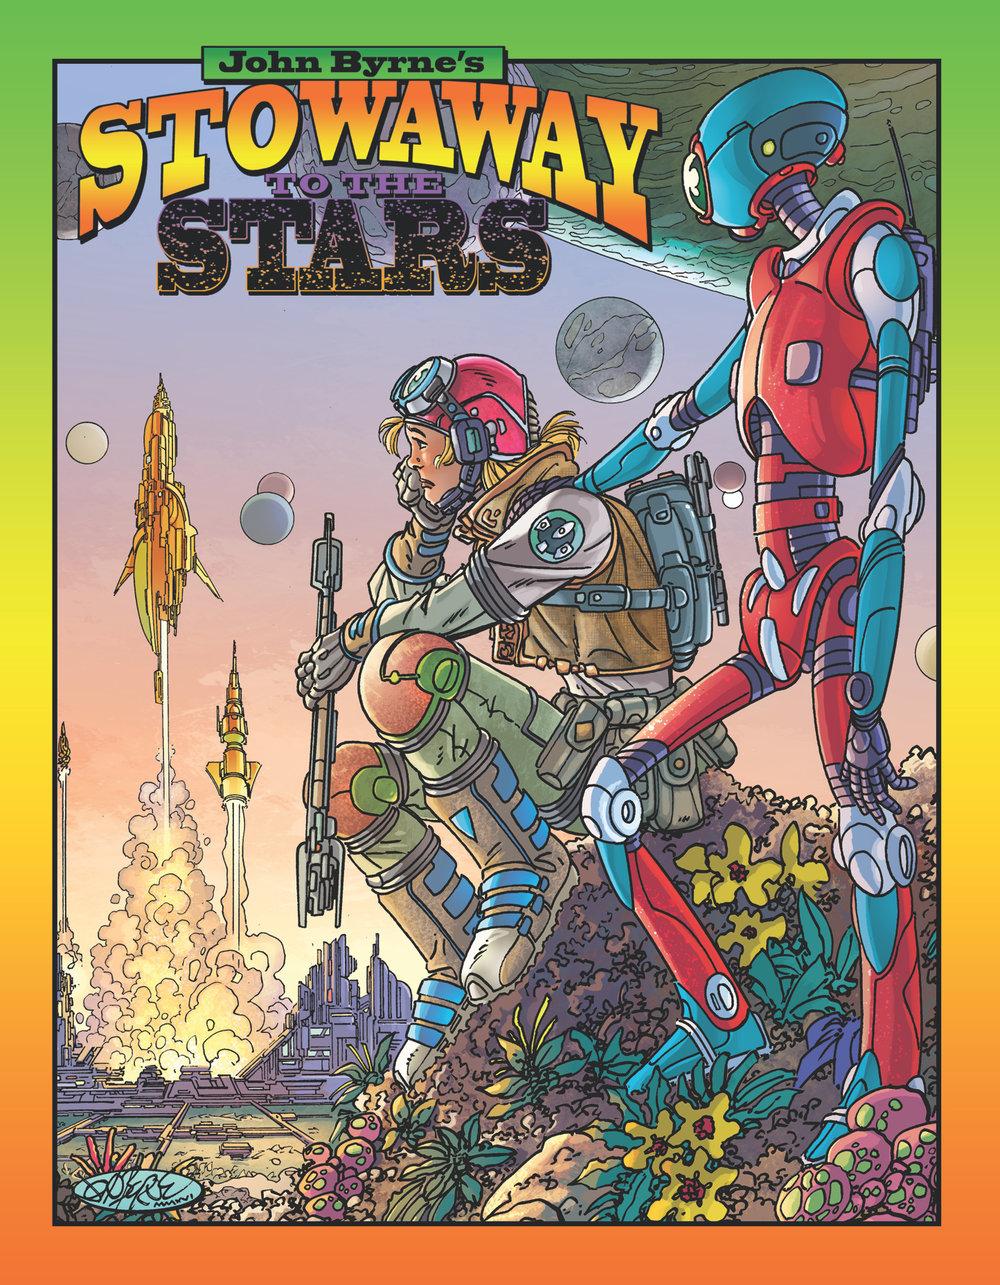 Stowaway-COVER_FINAL.jpg